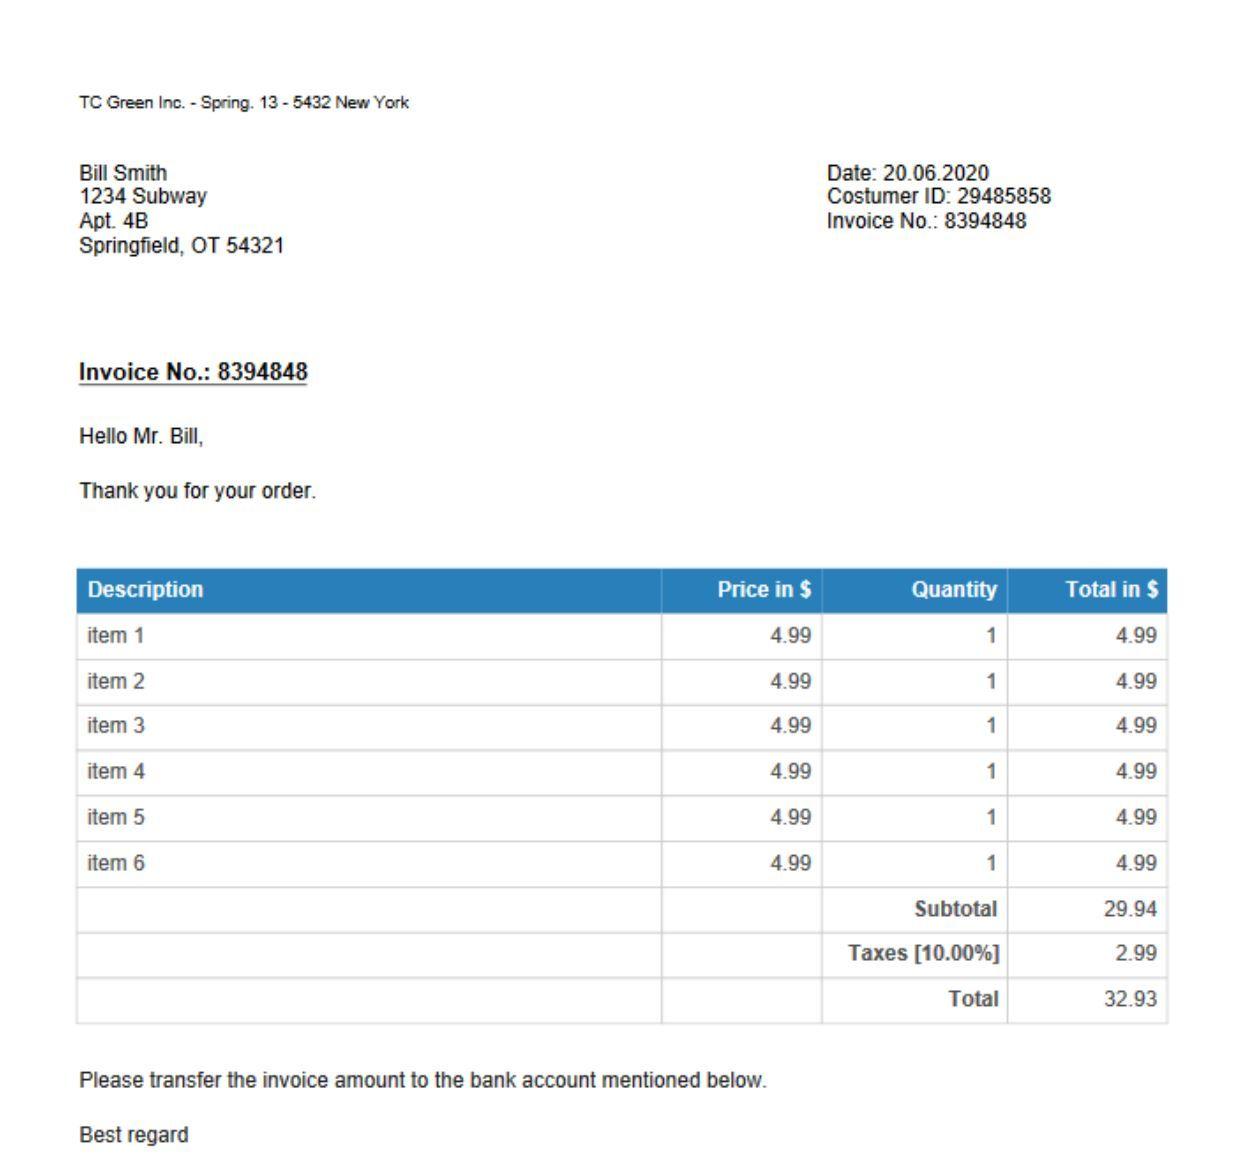 Receipt Template Created With Httpreceiptmakerorgeninvoice - Bill creator app